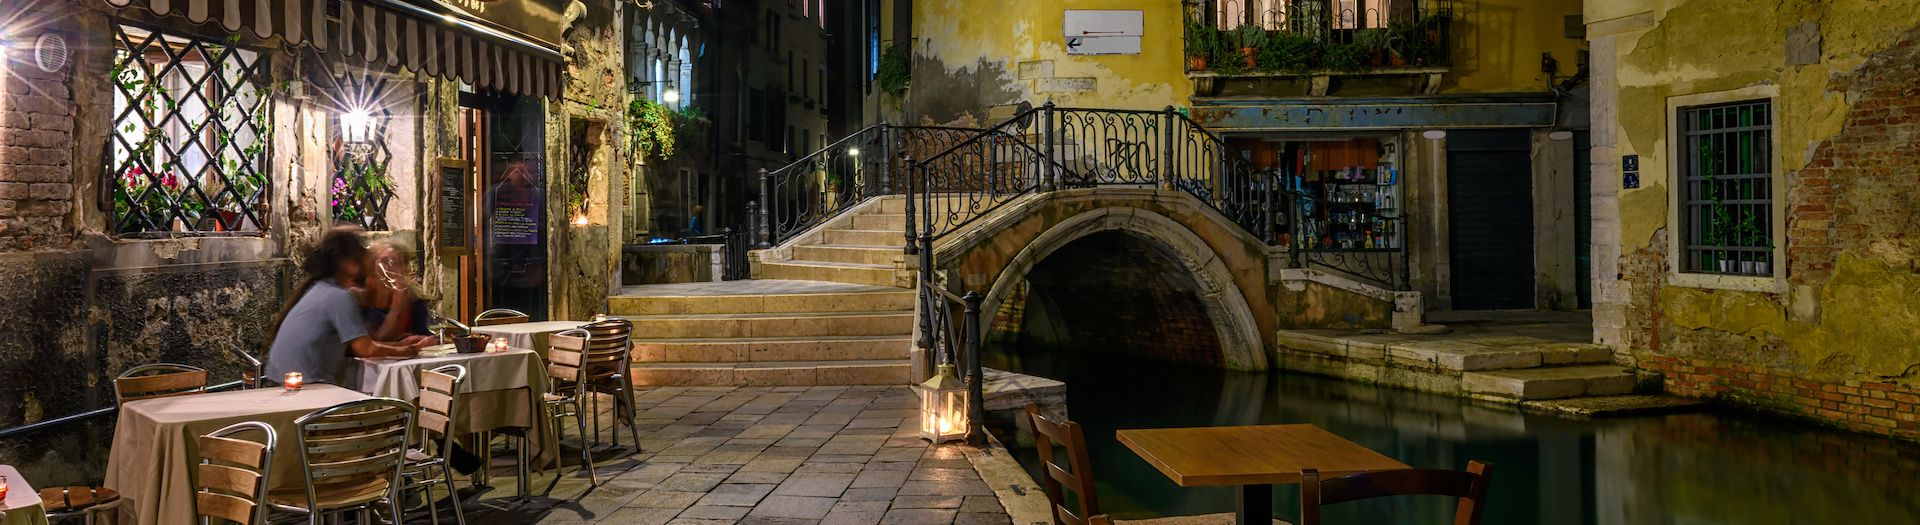 Venice Restaurants Page